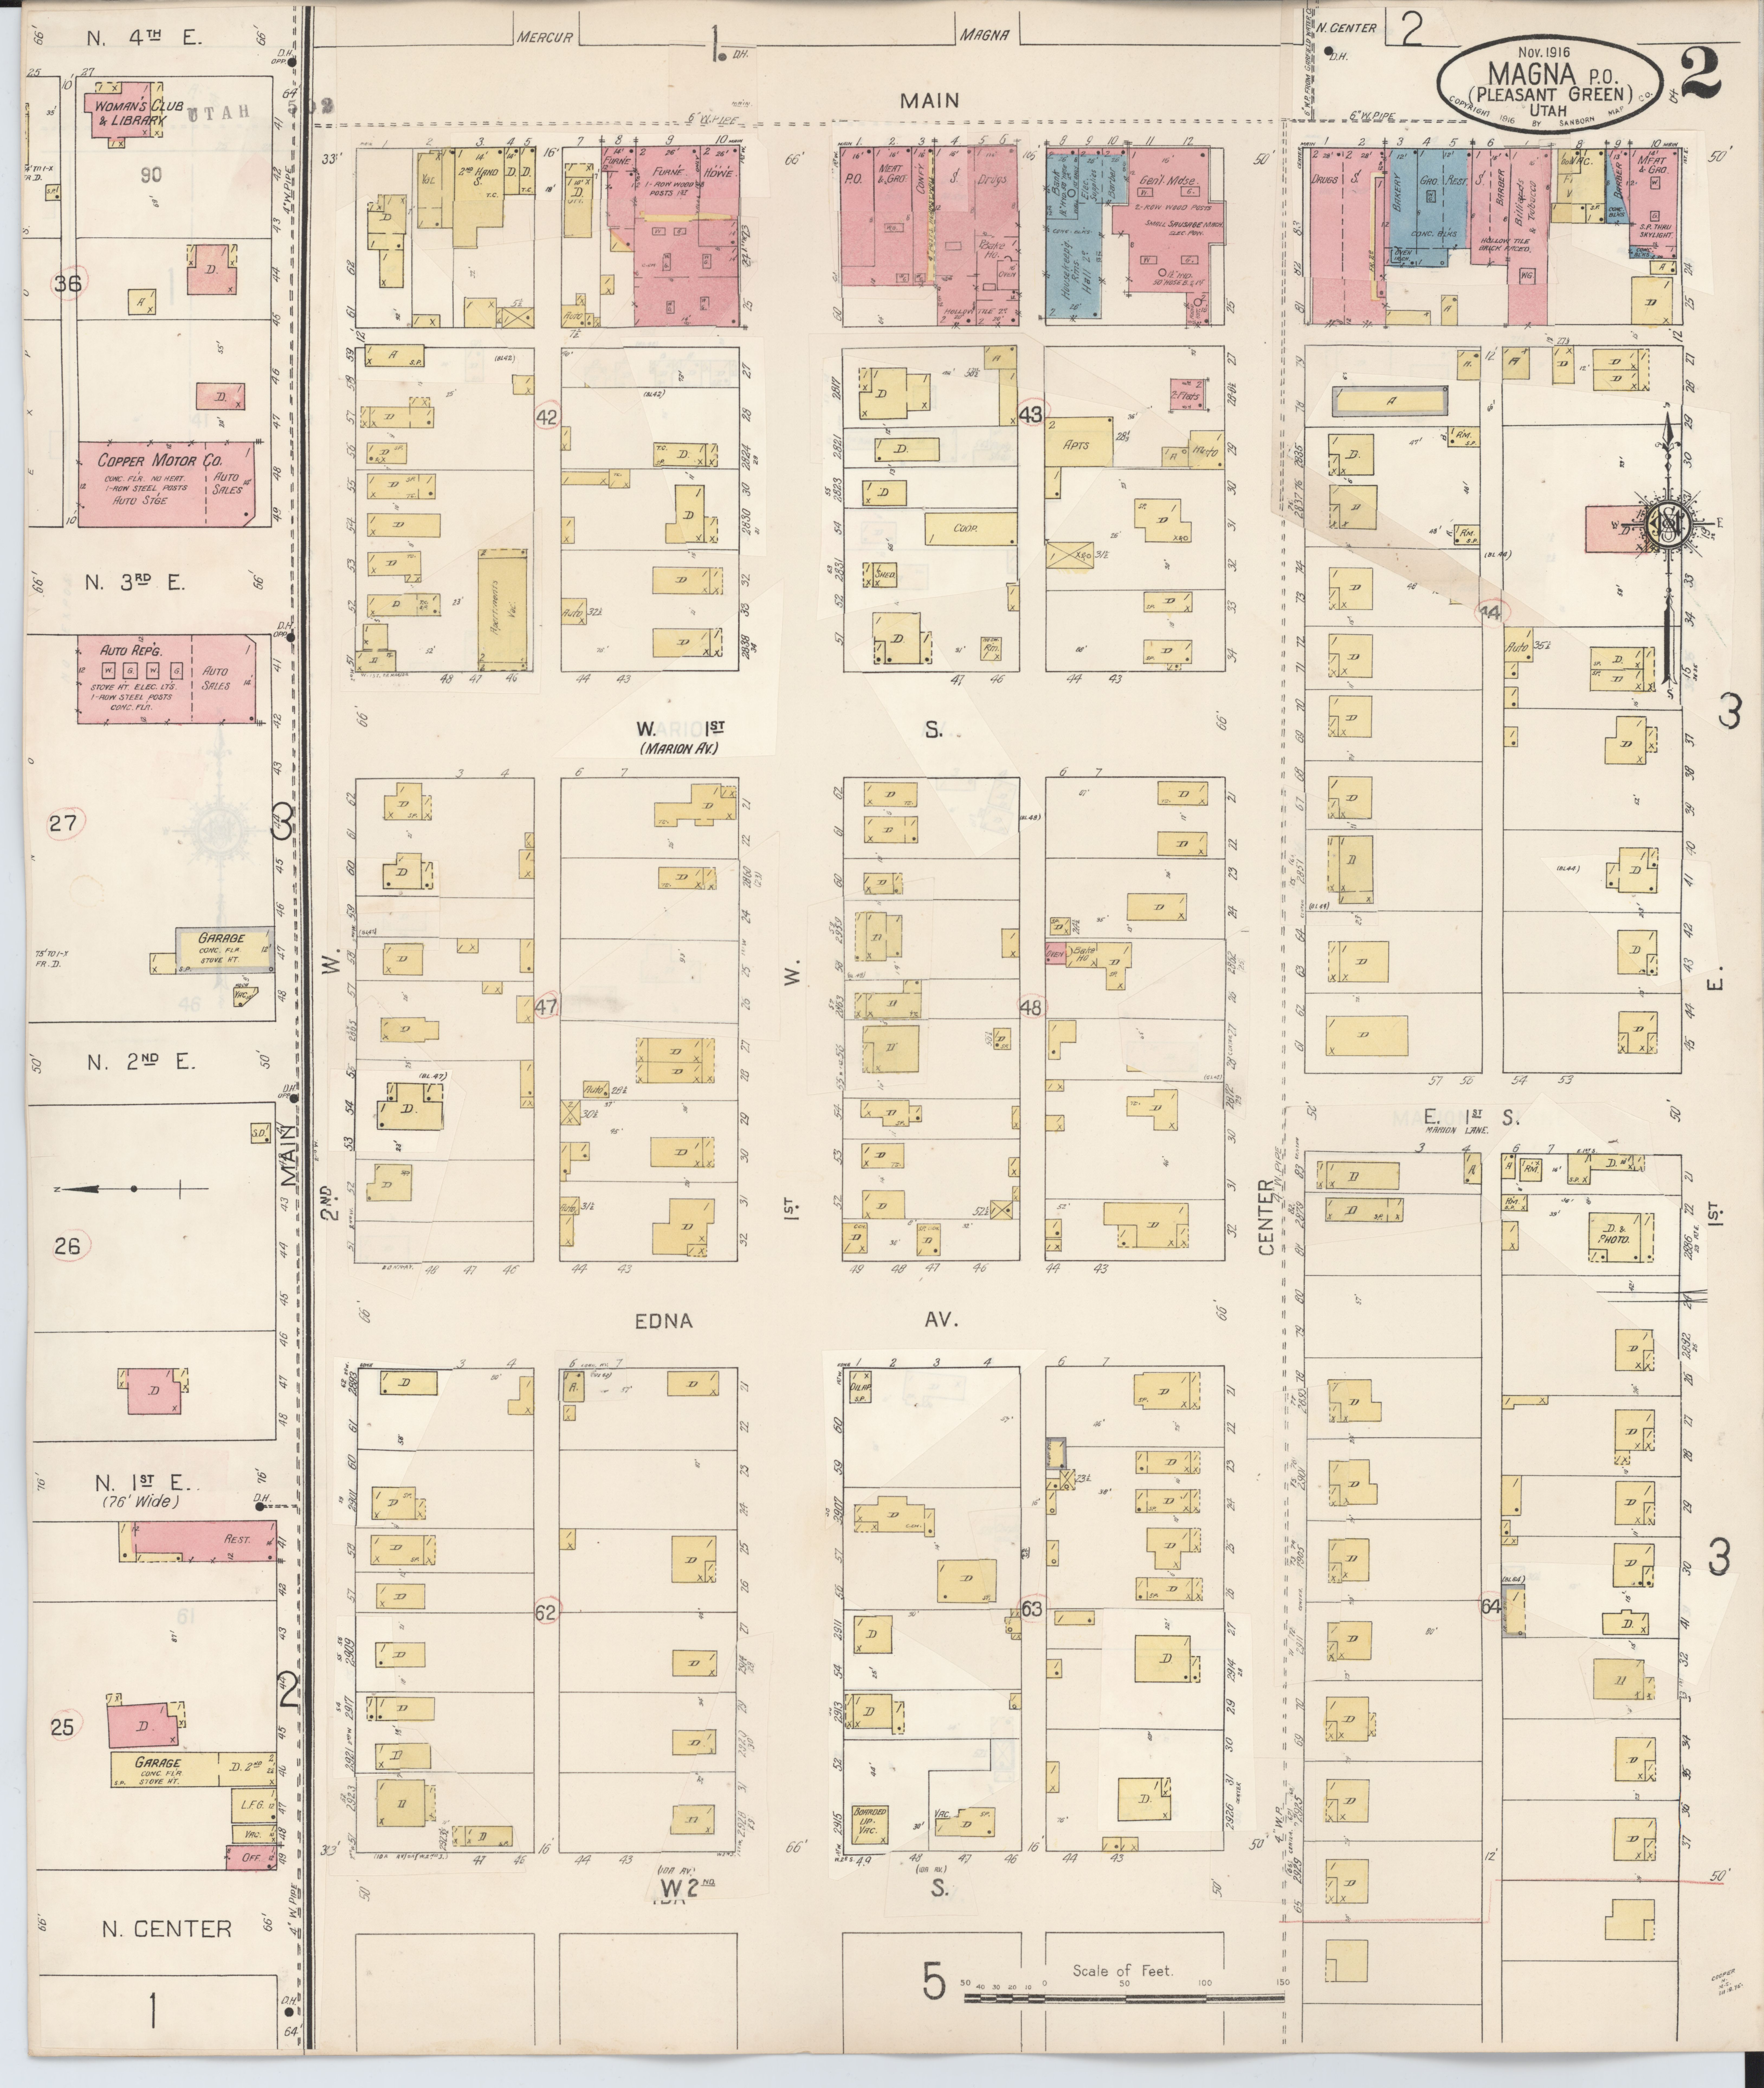 File:Sanborn Fire Insurance Map From Magna, Salt Lake